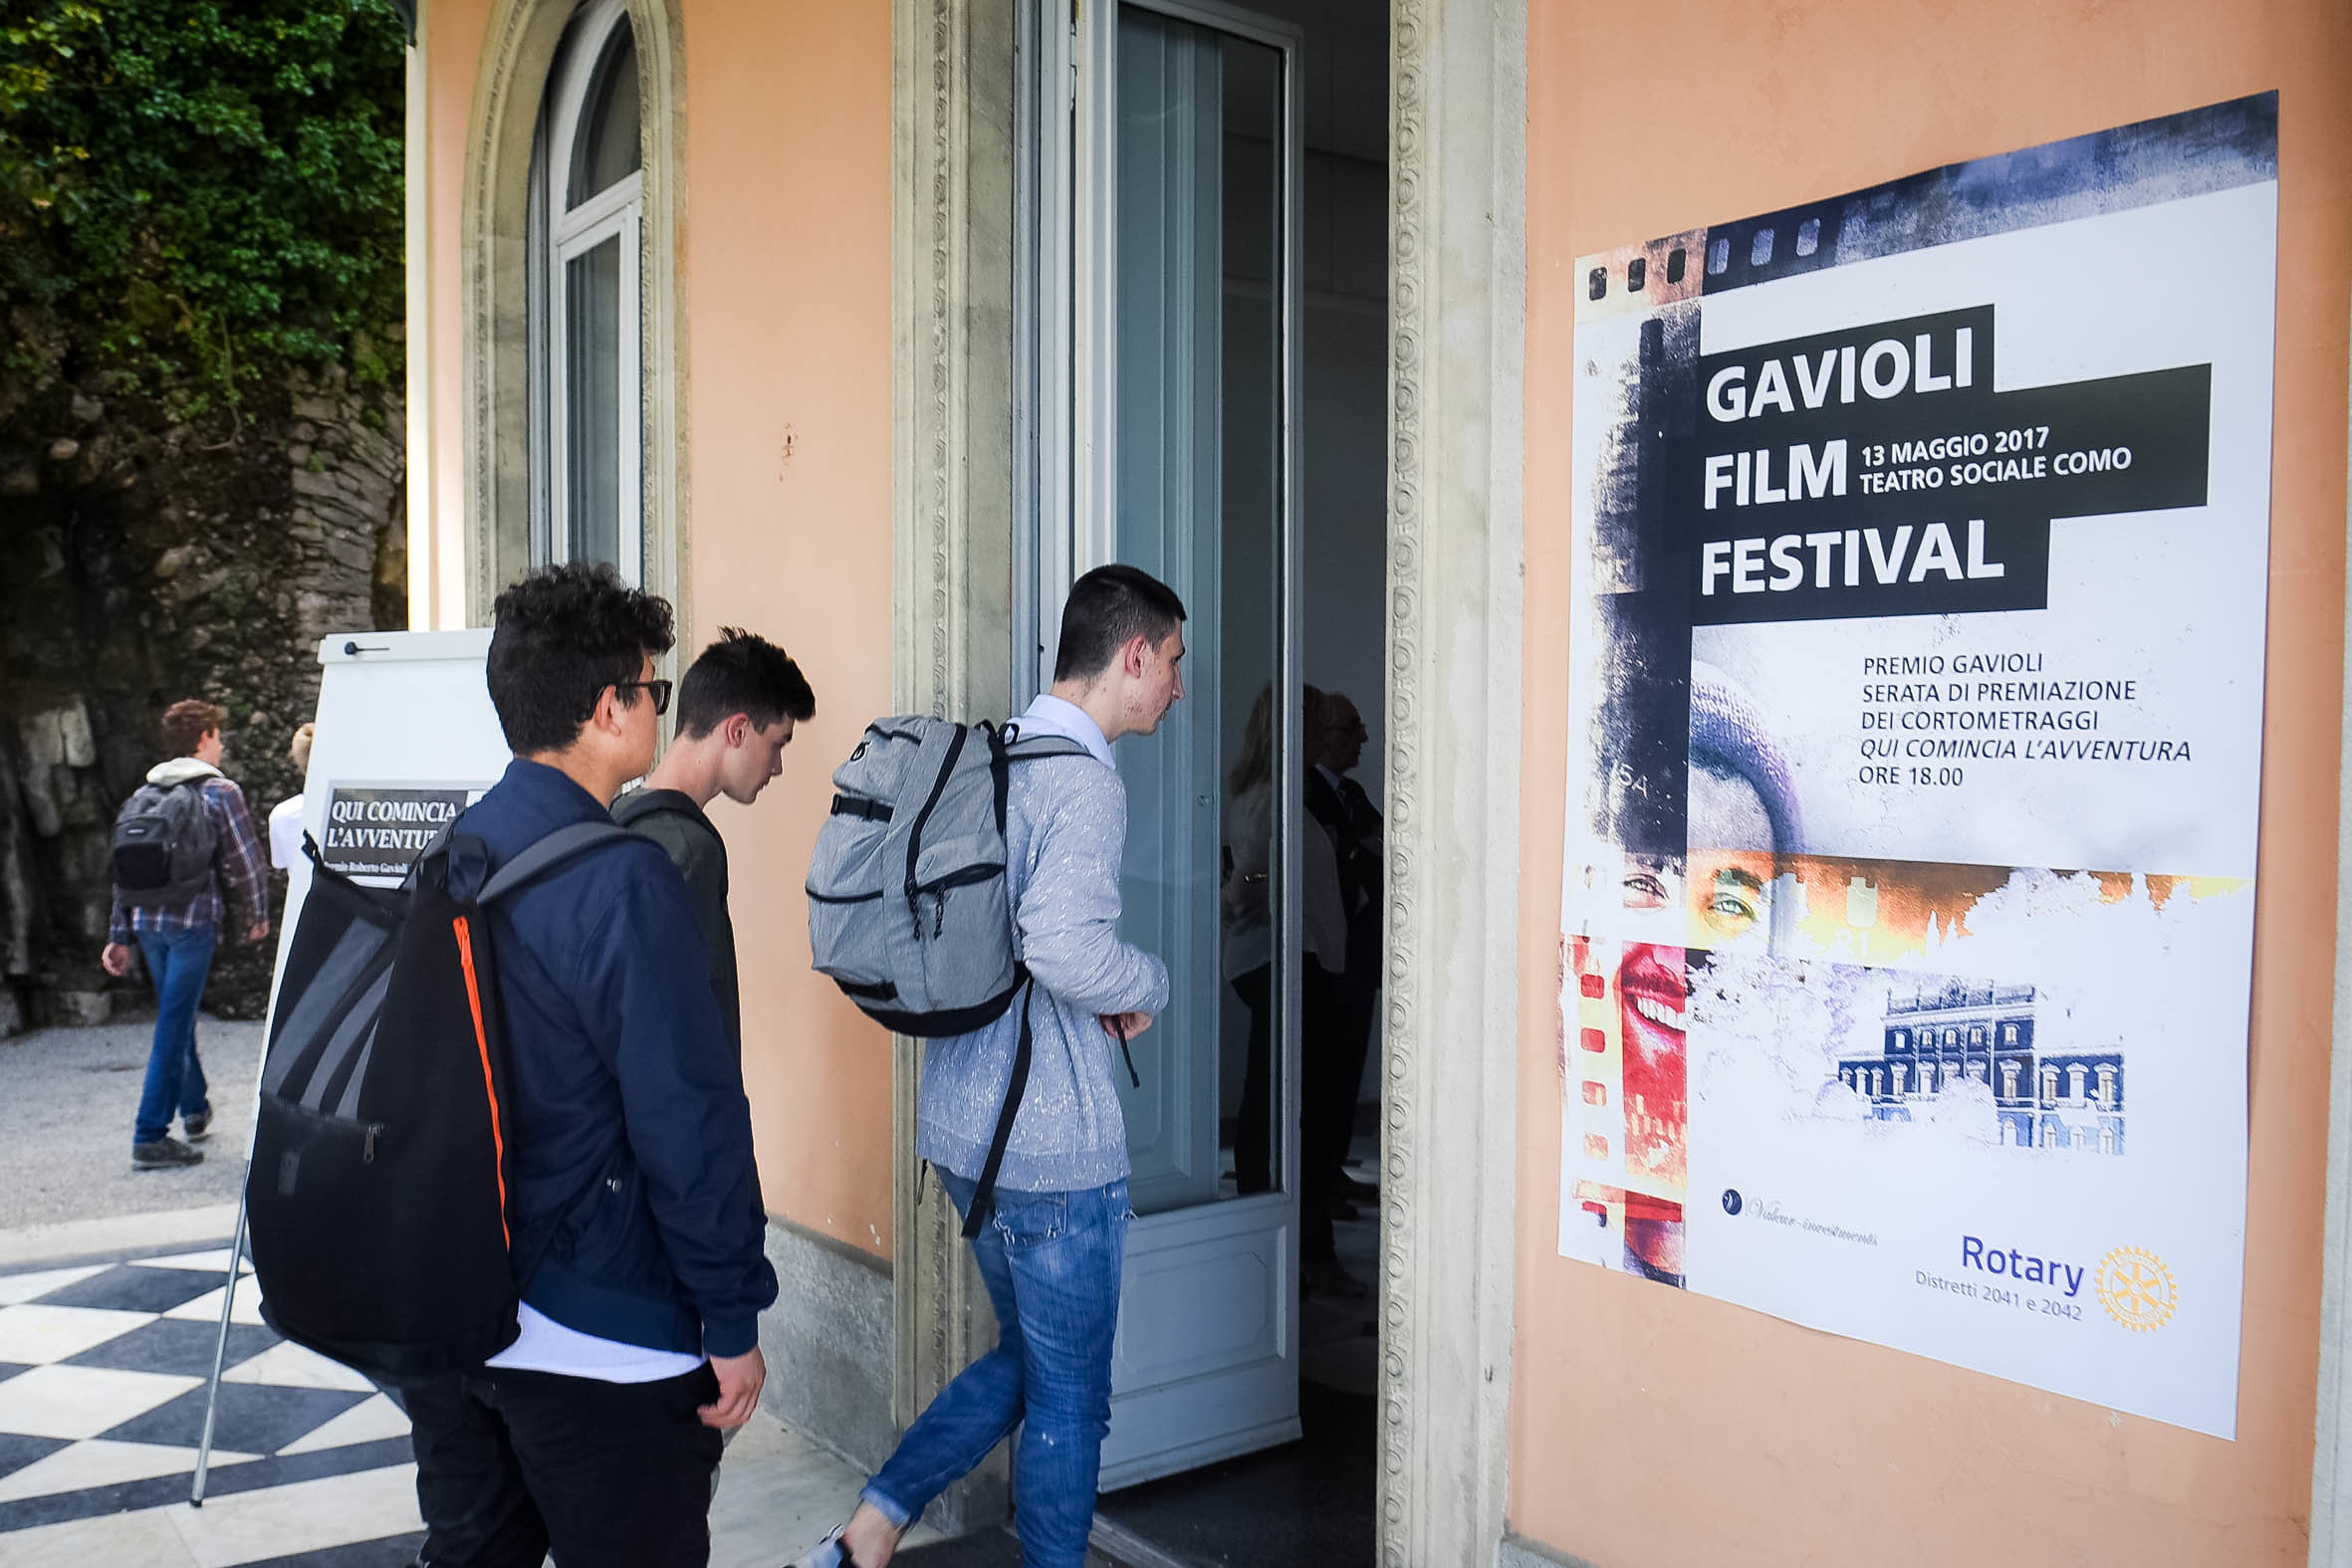 GavioliFilmFestivalwebsize026